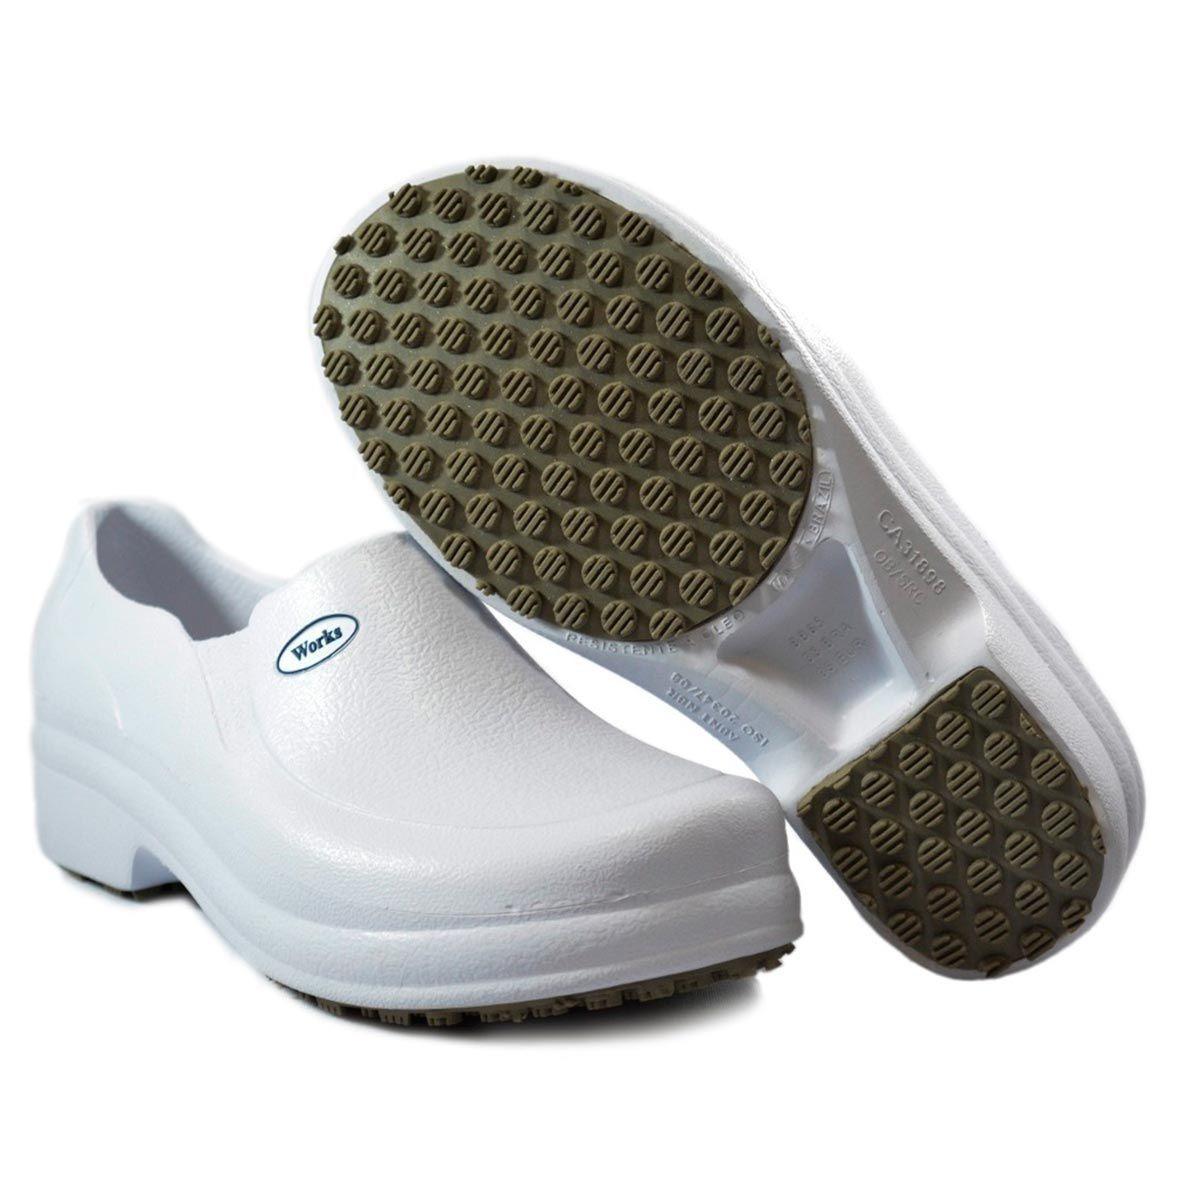 Sapato Soft Works Bb65 Antiderrapente Profissional Epi - R  52,50 em ... dd28076549